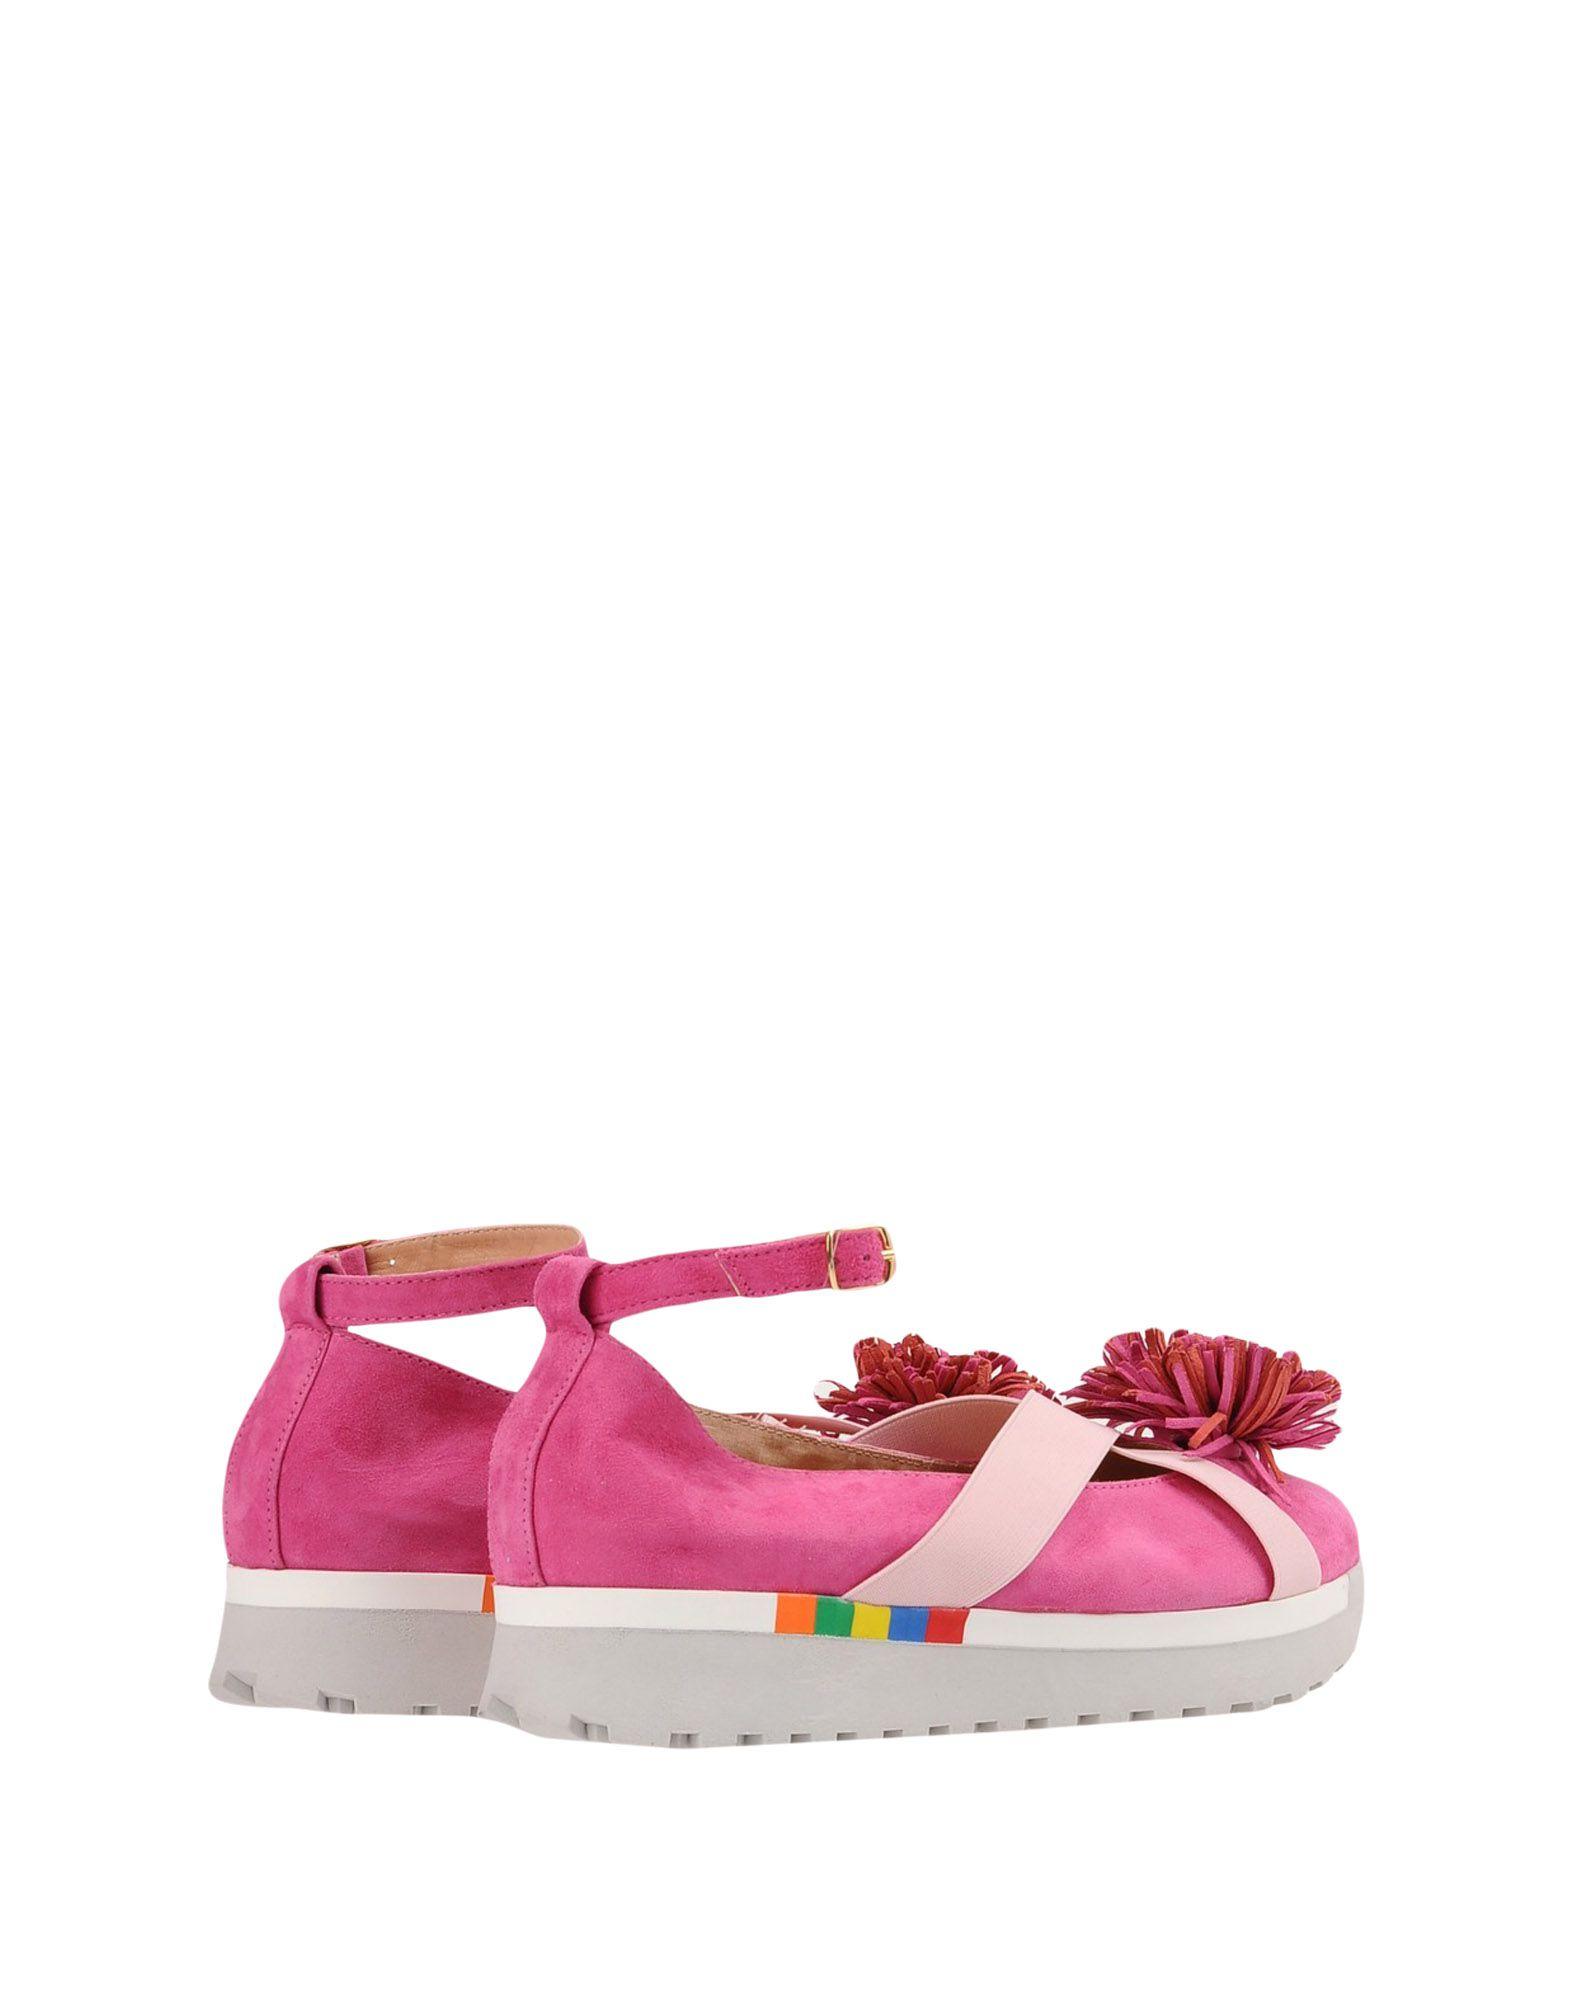 George J. Love Sneakers Damen  11444279OB Gute Qualität beliebte Schuhe